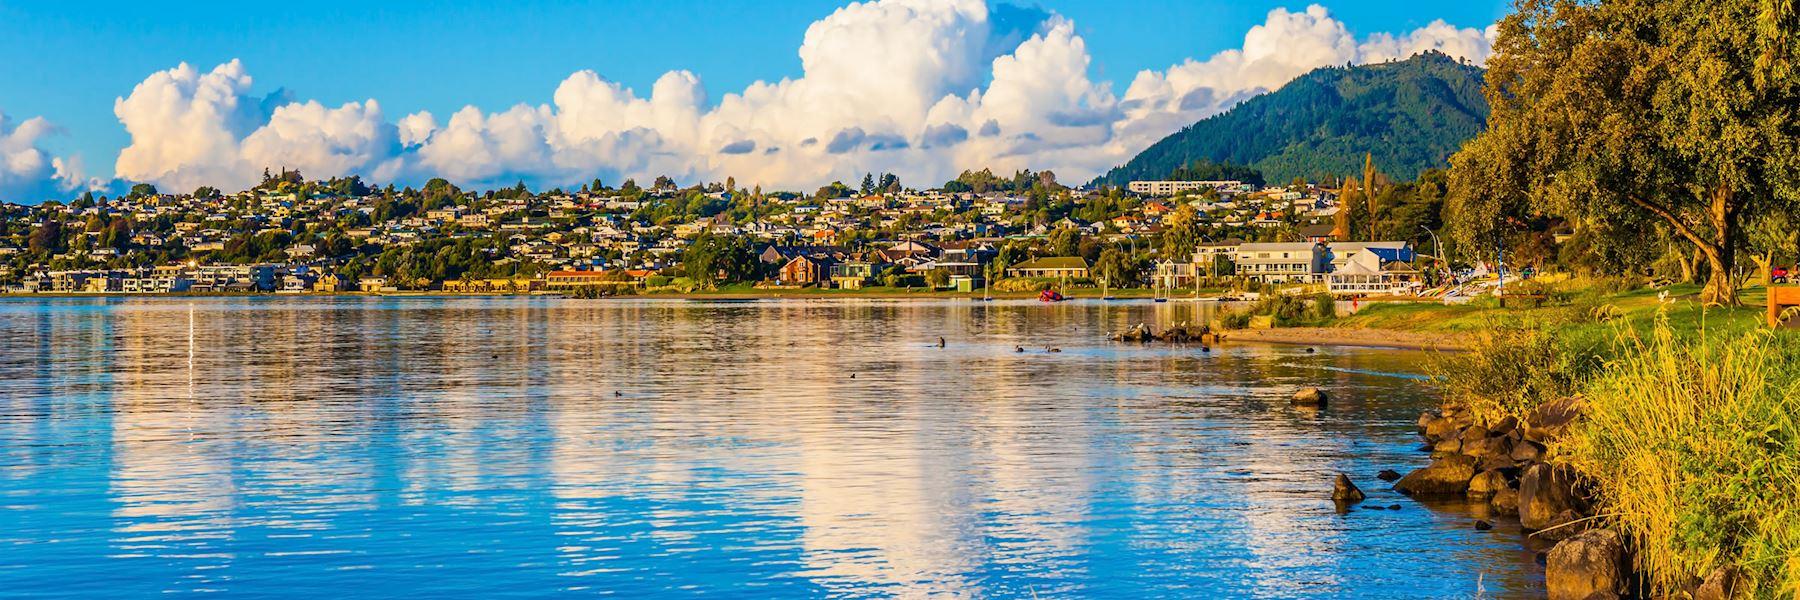 Visit Lake Taupo, New Zealand